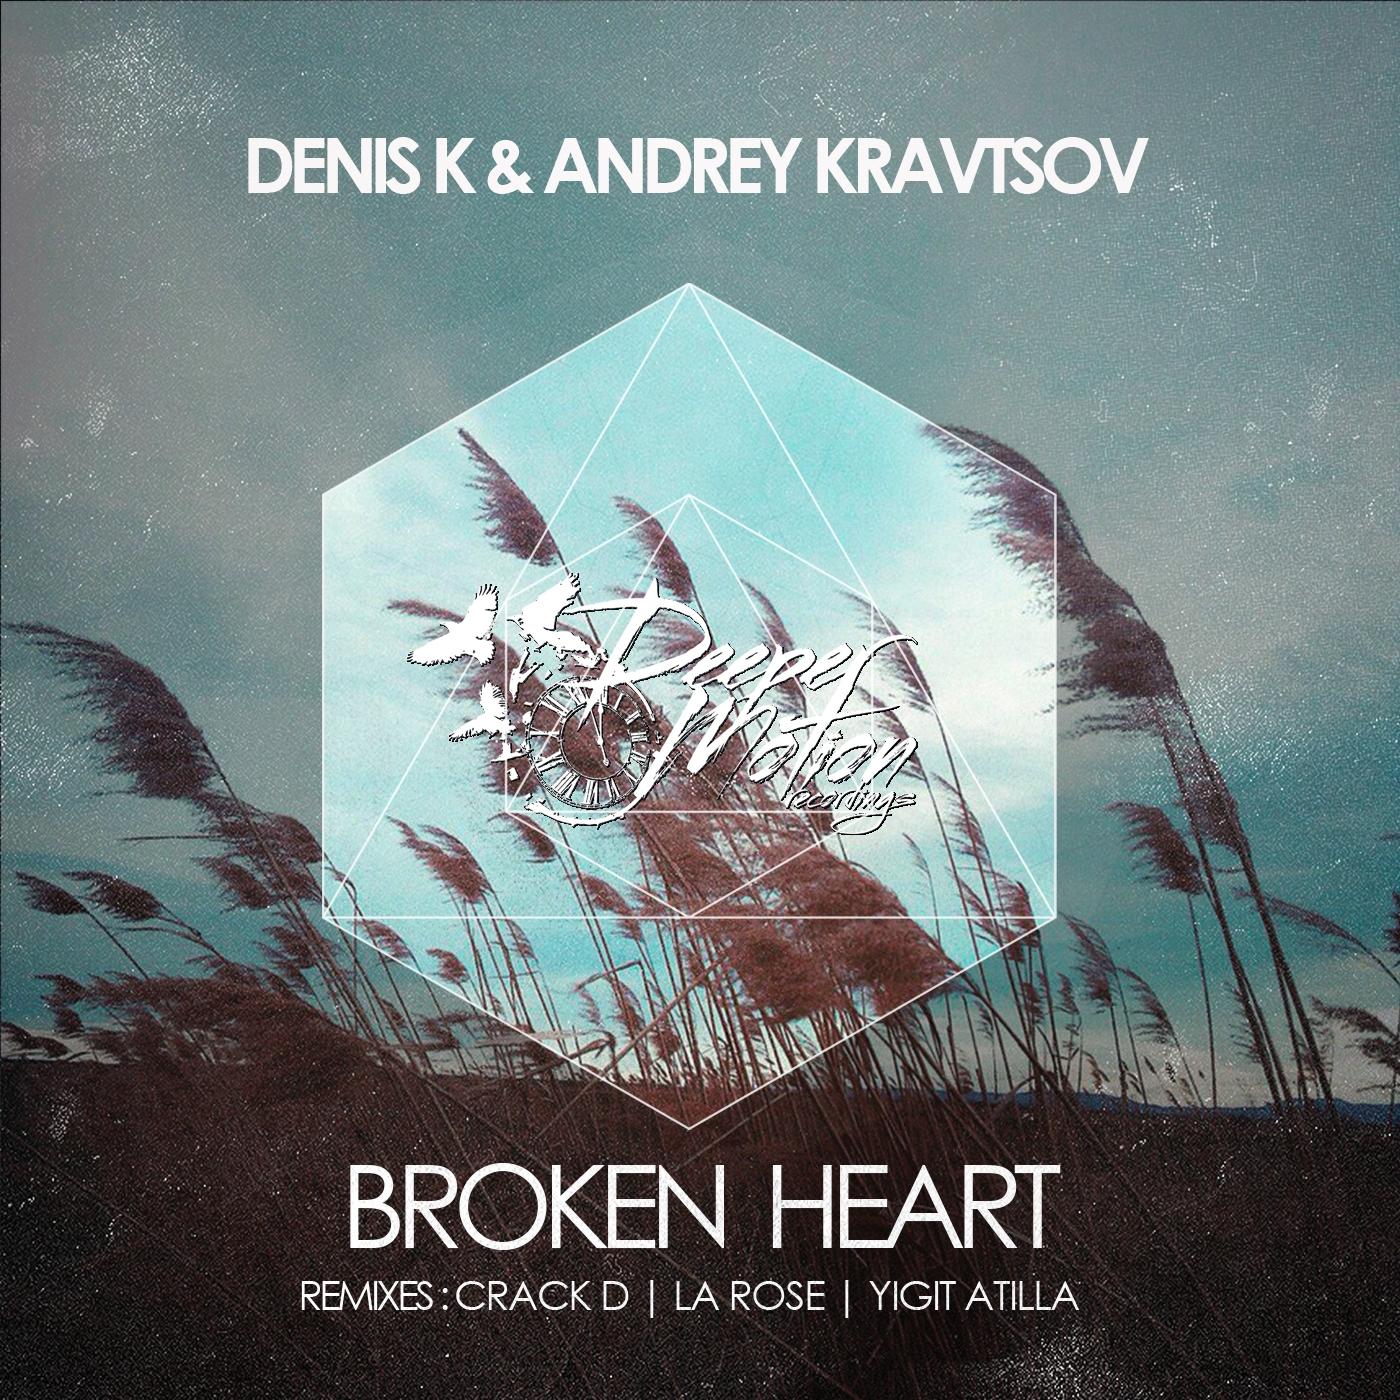 Denis K & Andrey Kravtsov - Broken Heart (La Rose Remix)